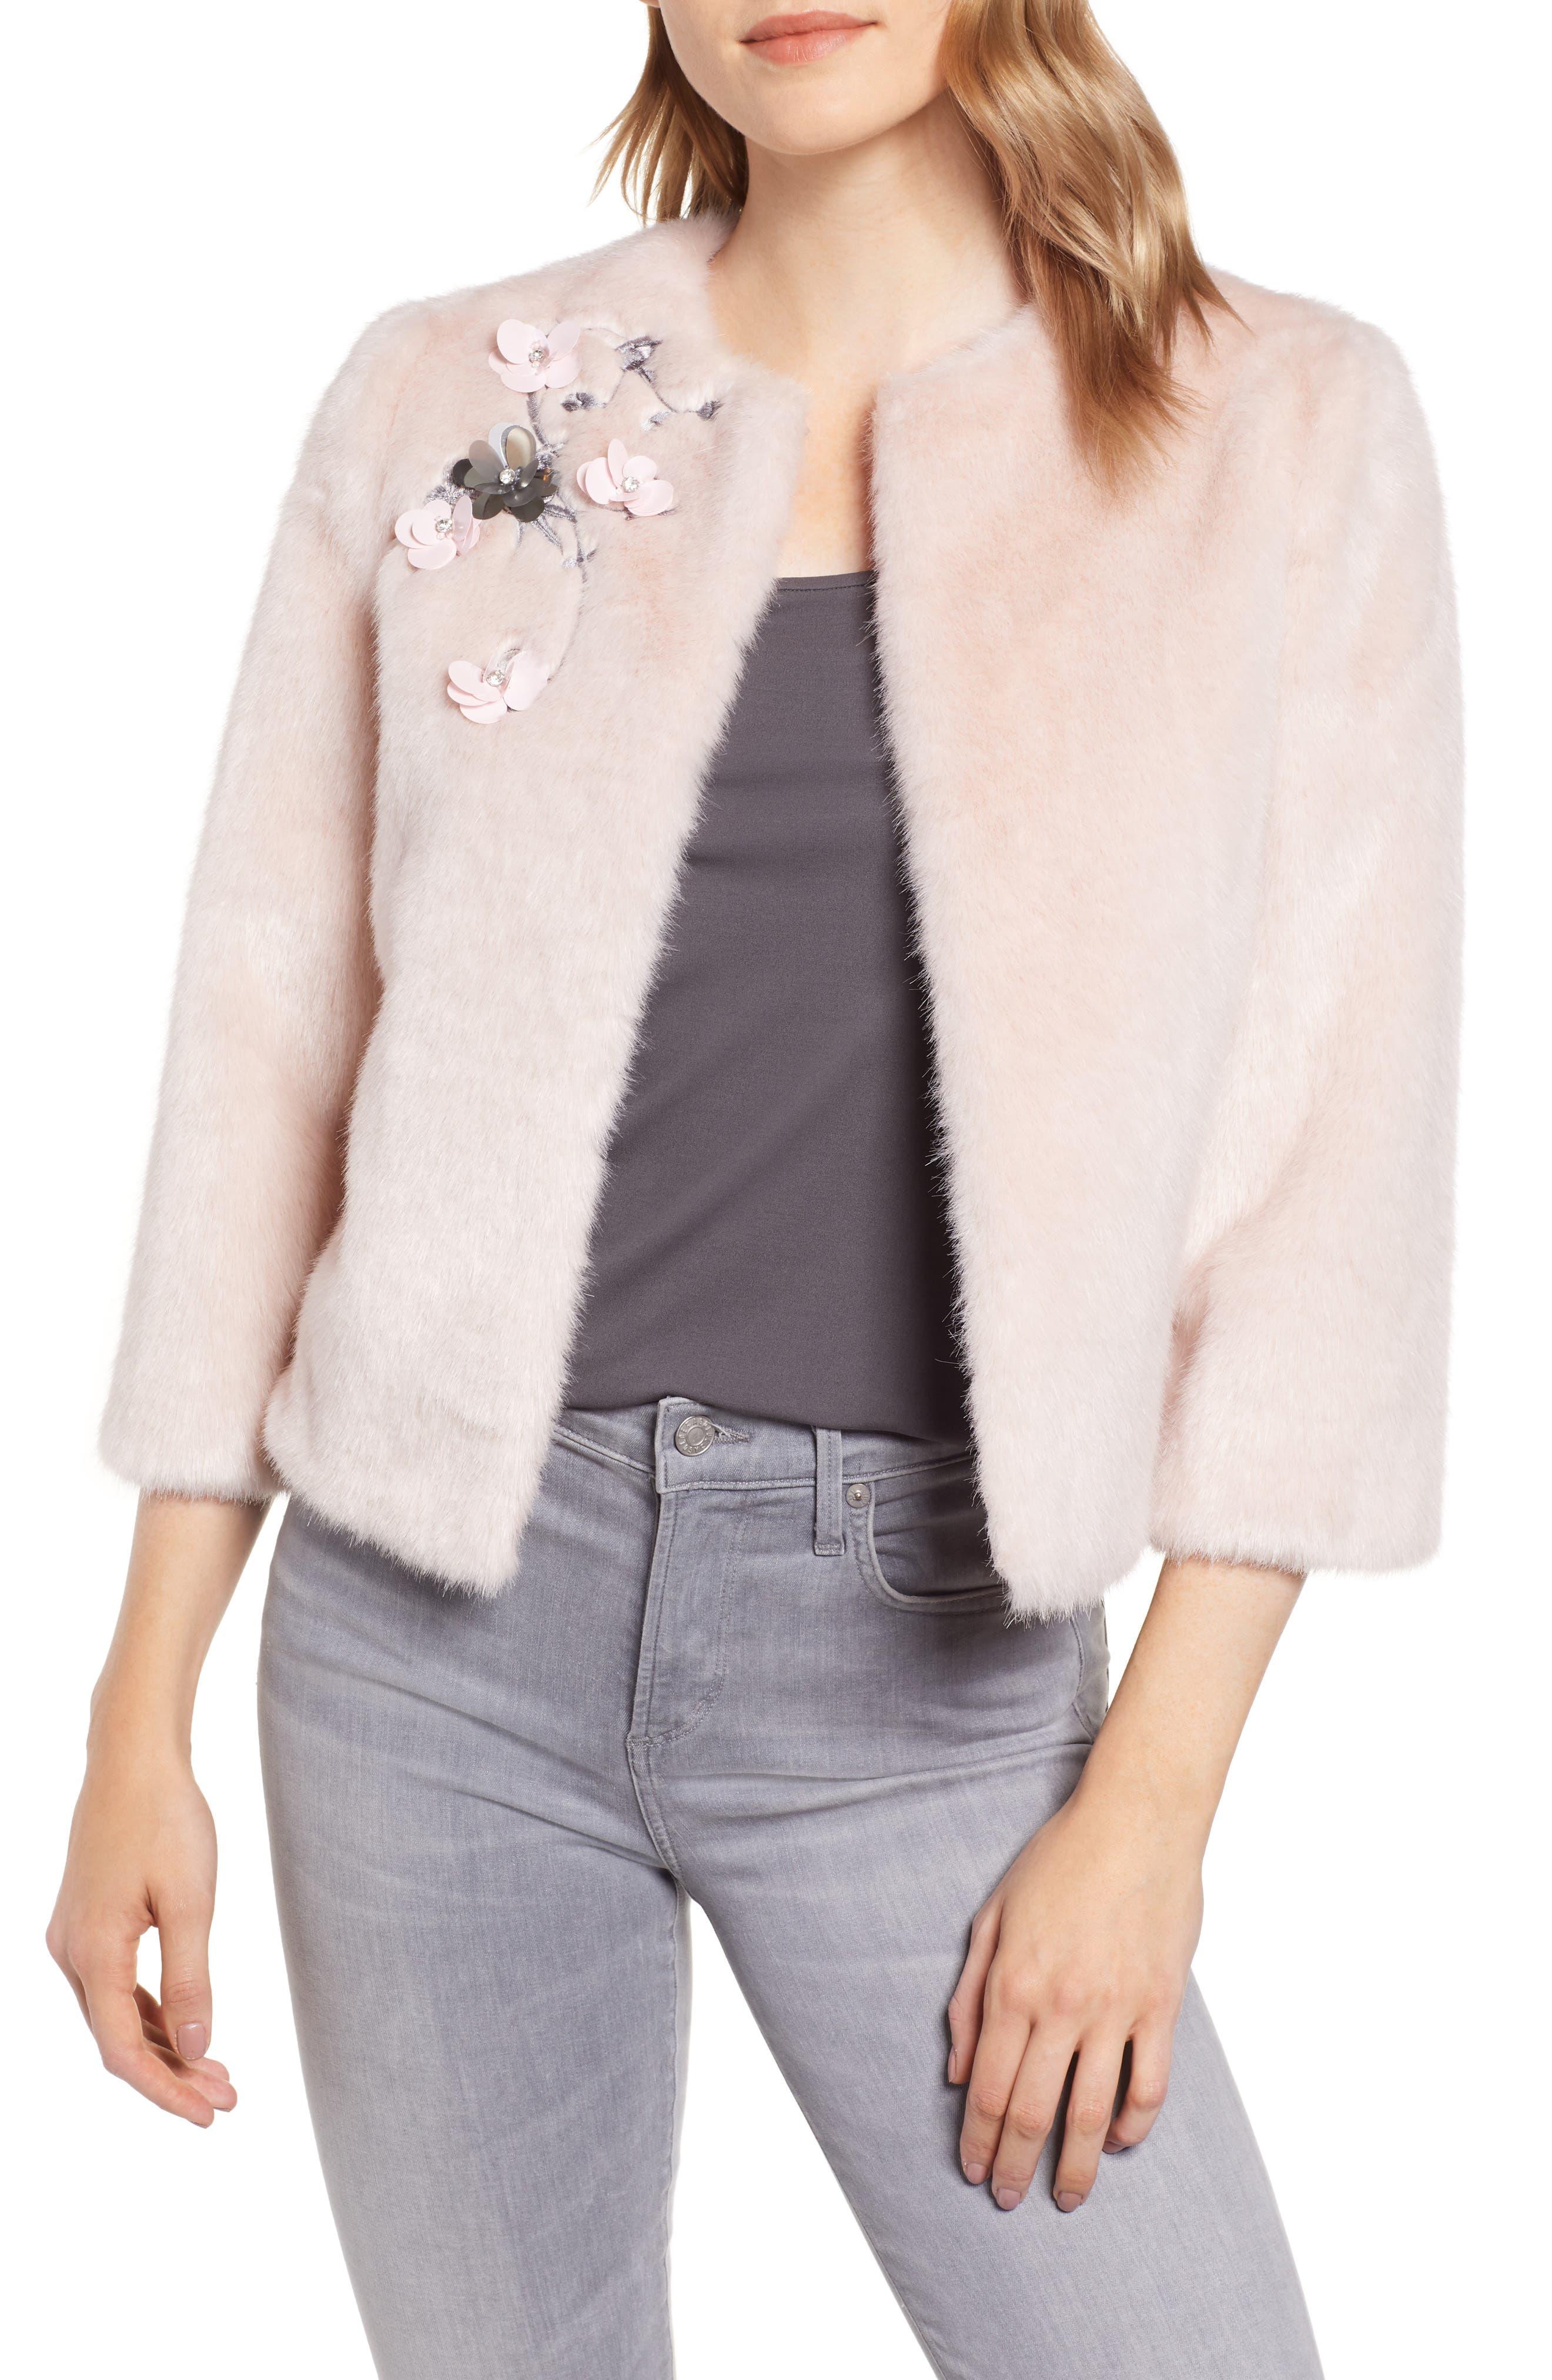 Appliqué Embellished Faux Fur Crop Jacket,                             Main thumbnail 1, color,                             NUDE PINK